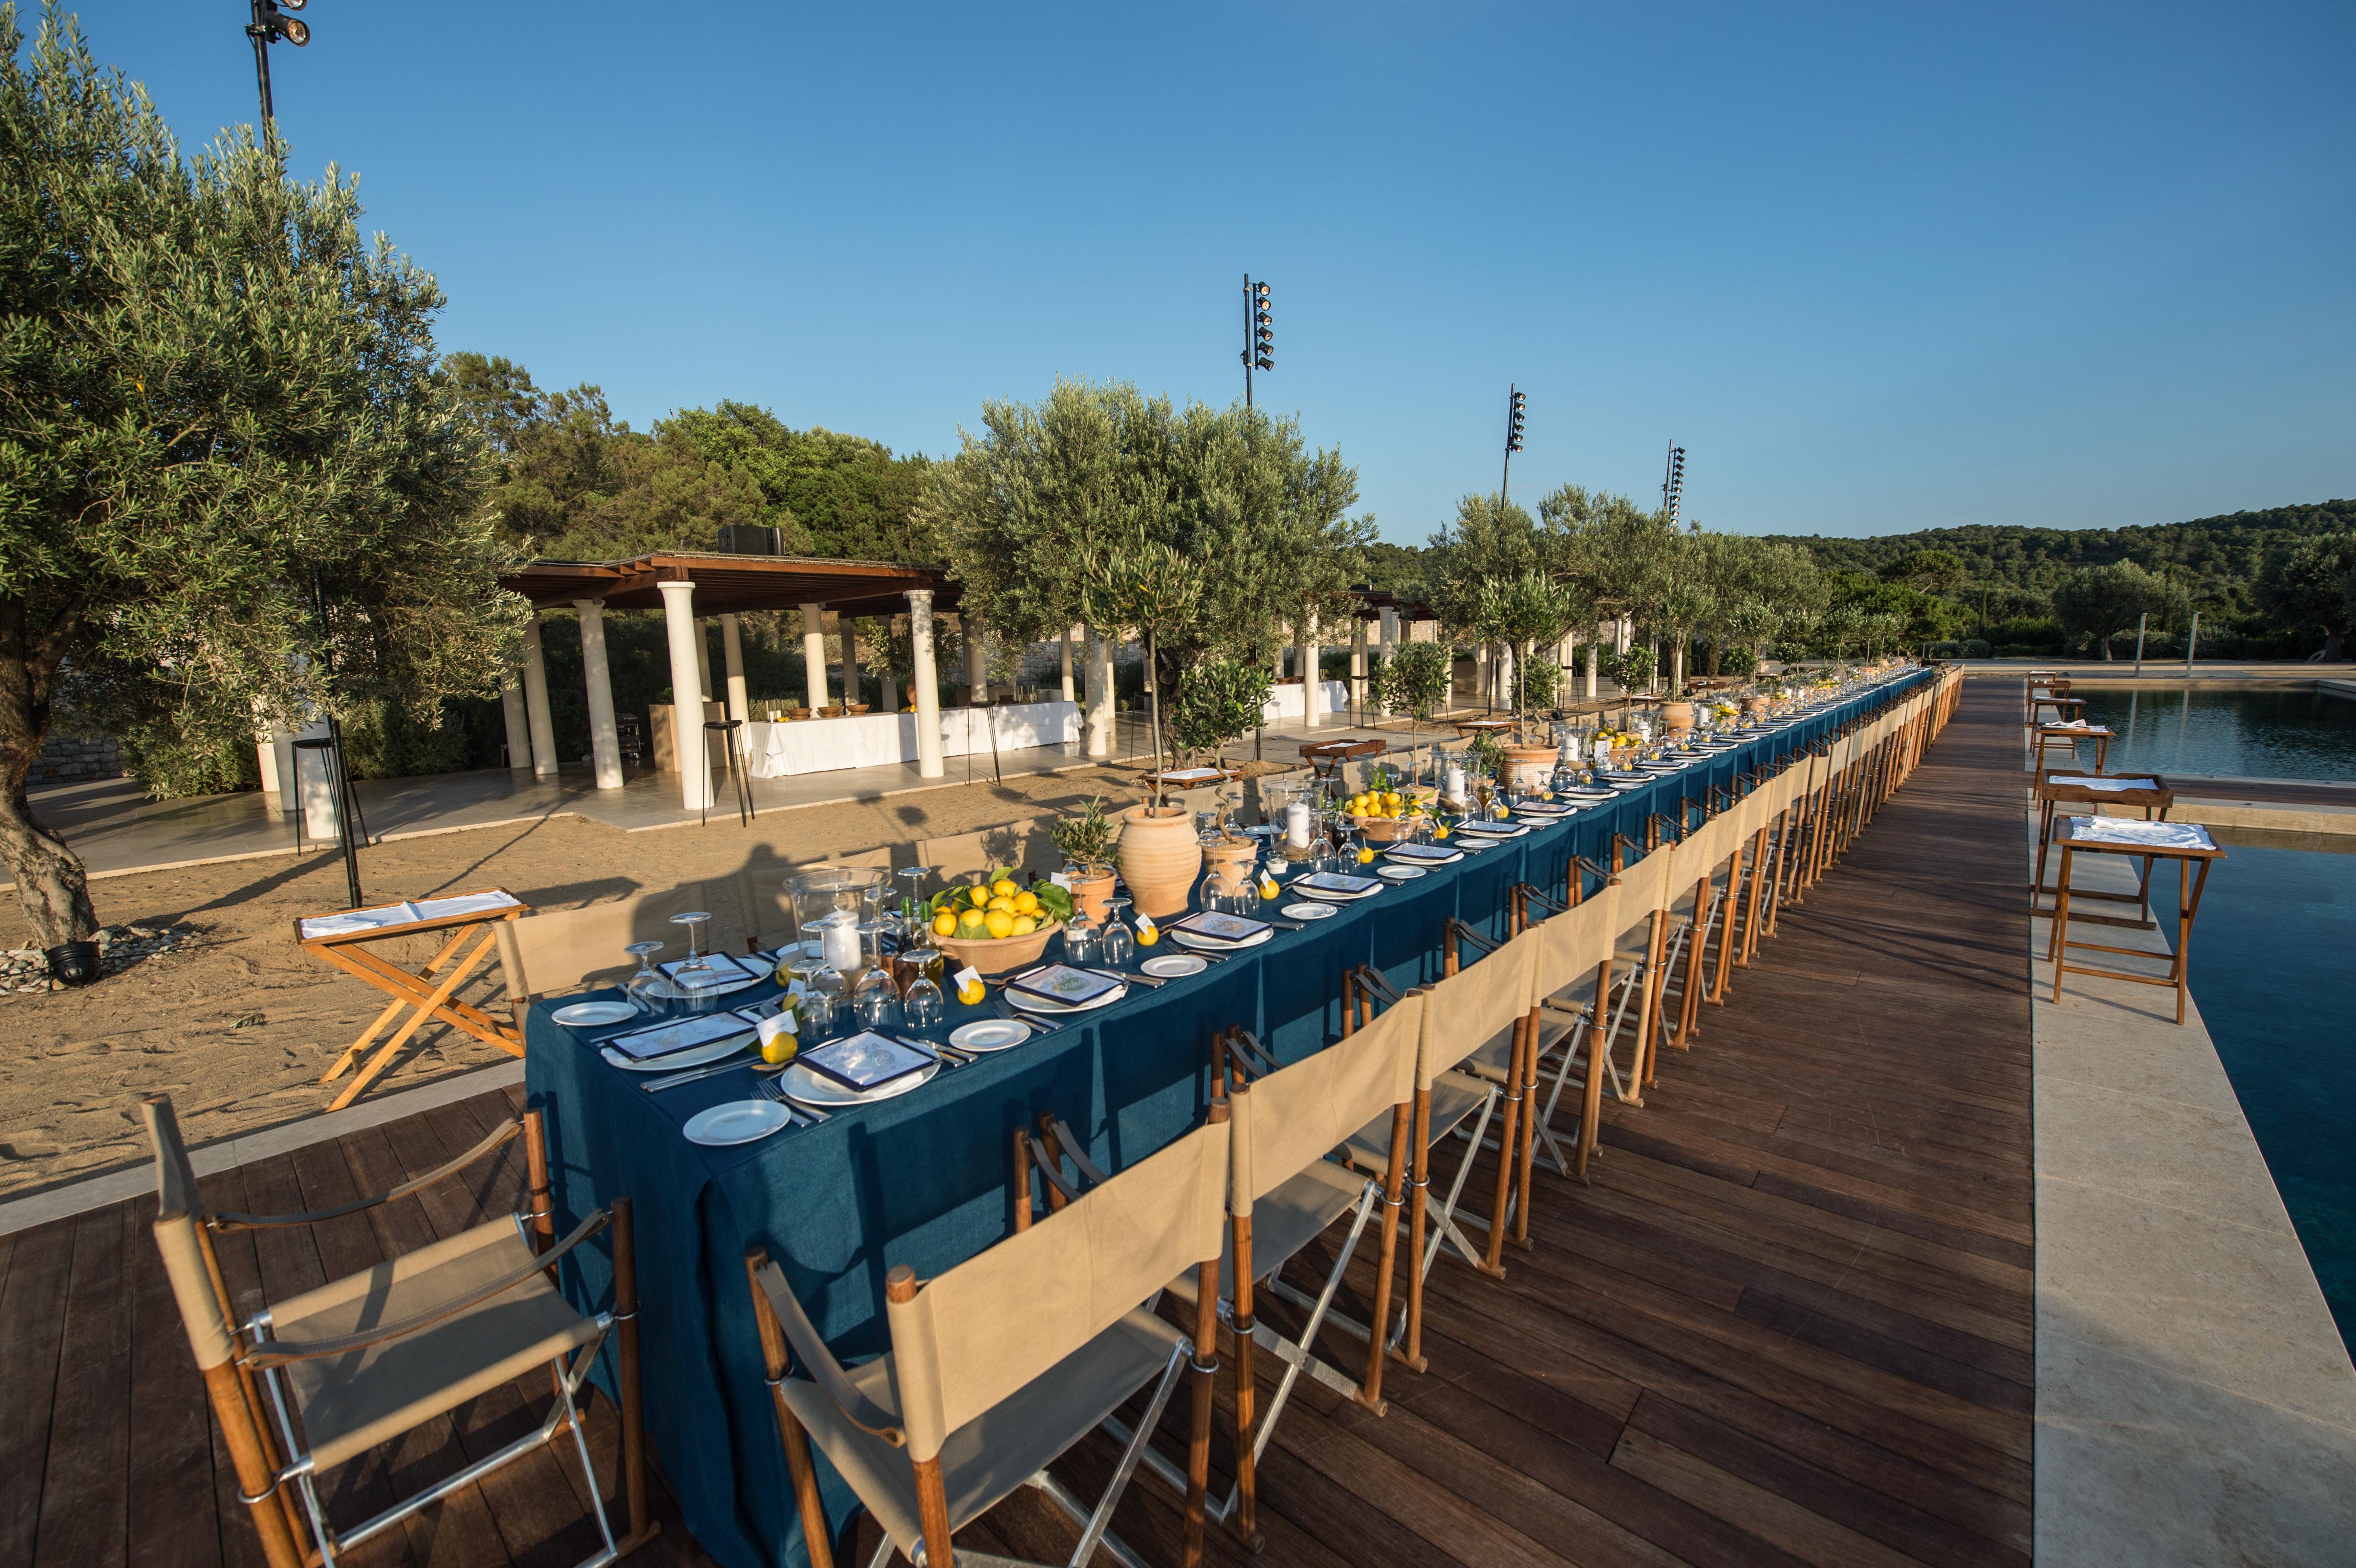 Poolside Birthday Celebration in Greece - David Monn